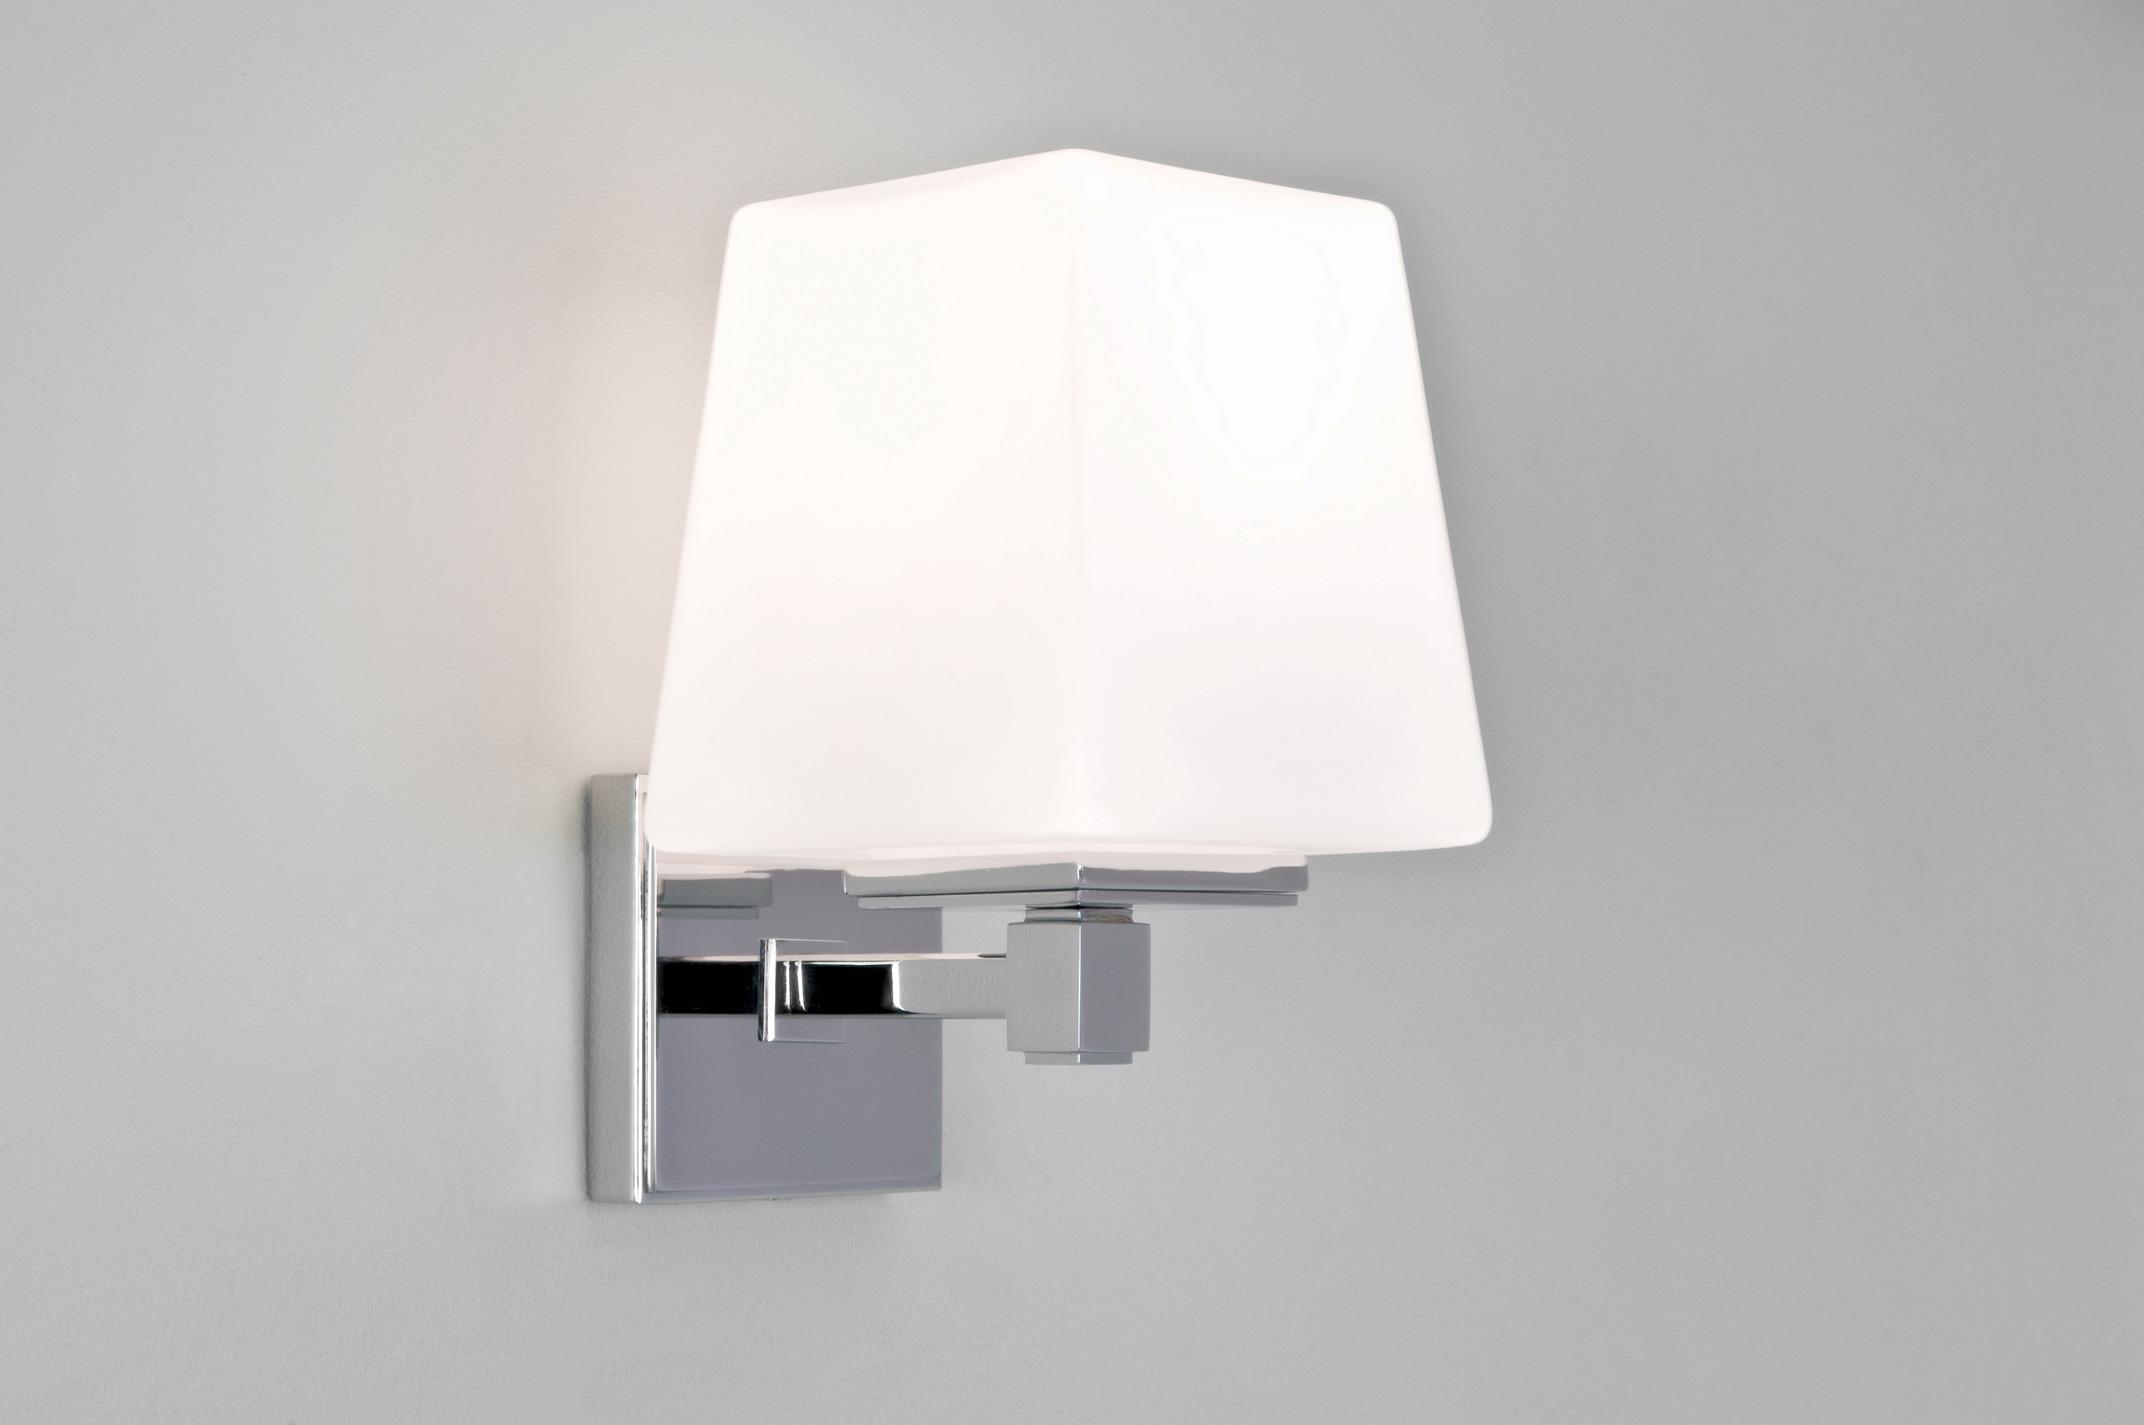 Astro noventa 0656 bathroom square wall light 1 x 60w e14 for Appliques salle de bain ip44